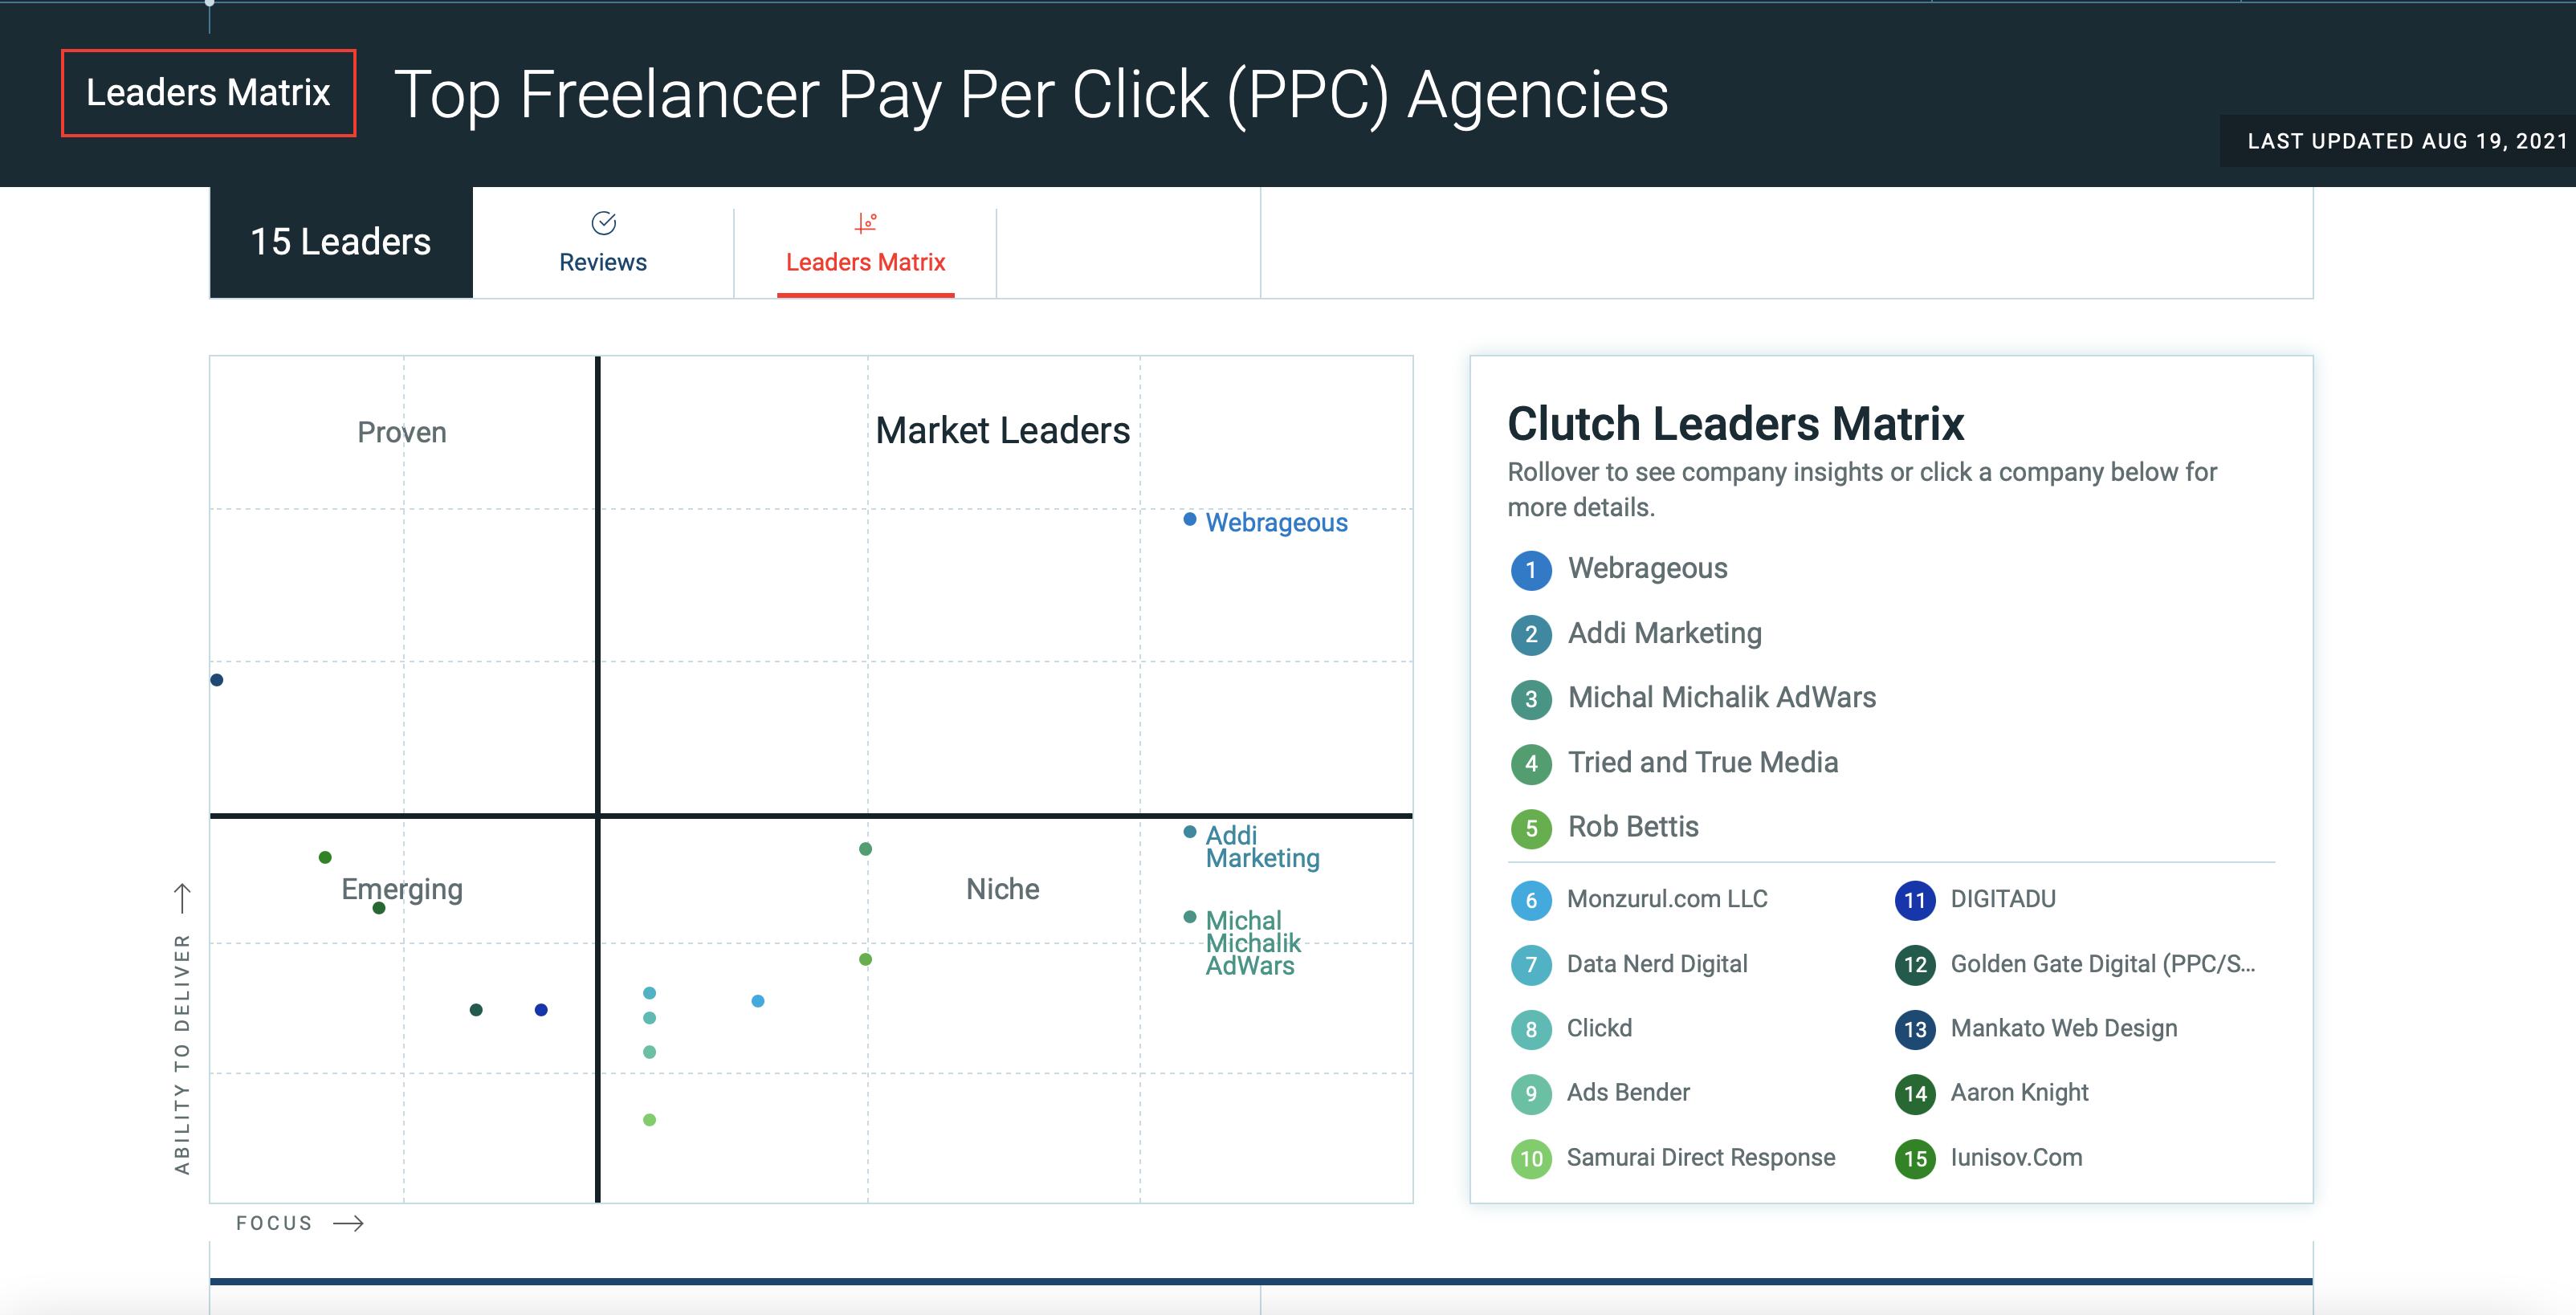 Clutch Leaders Matrix of the Top Freelancer PPC Agencies